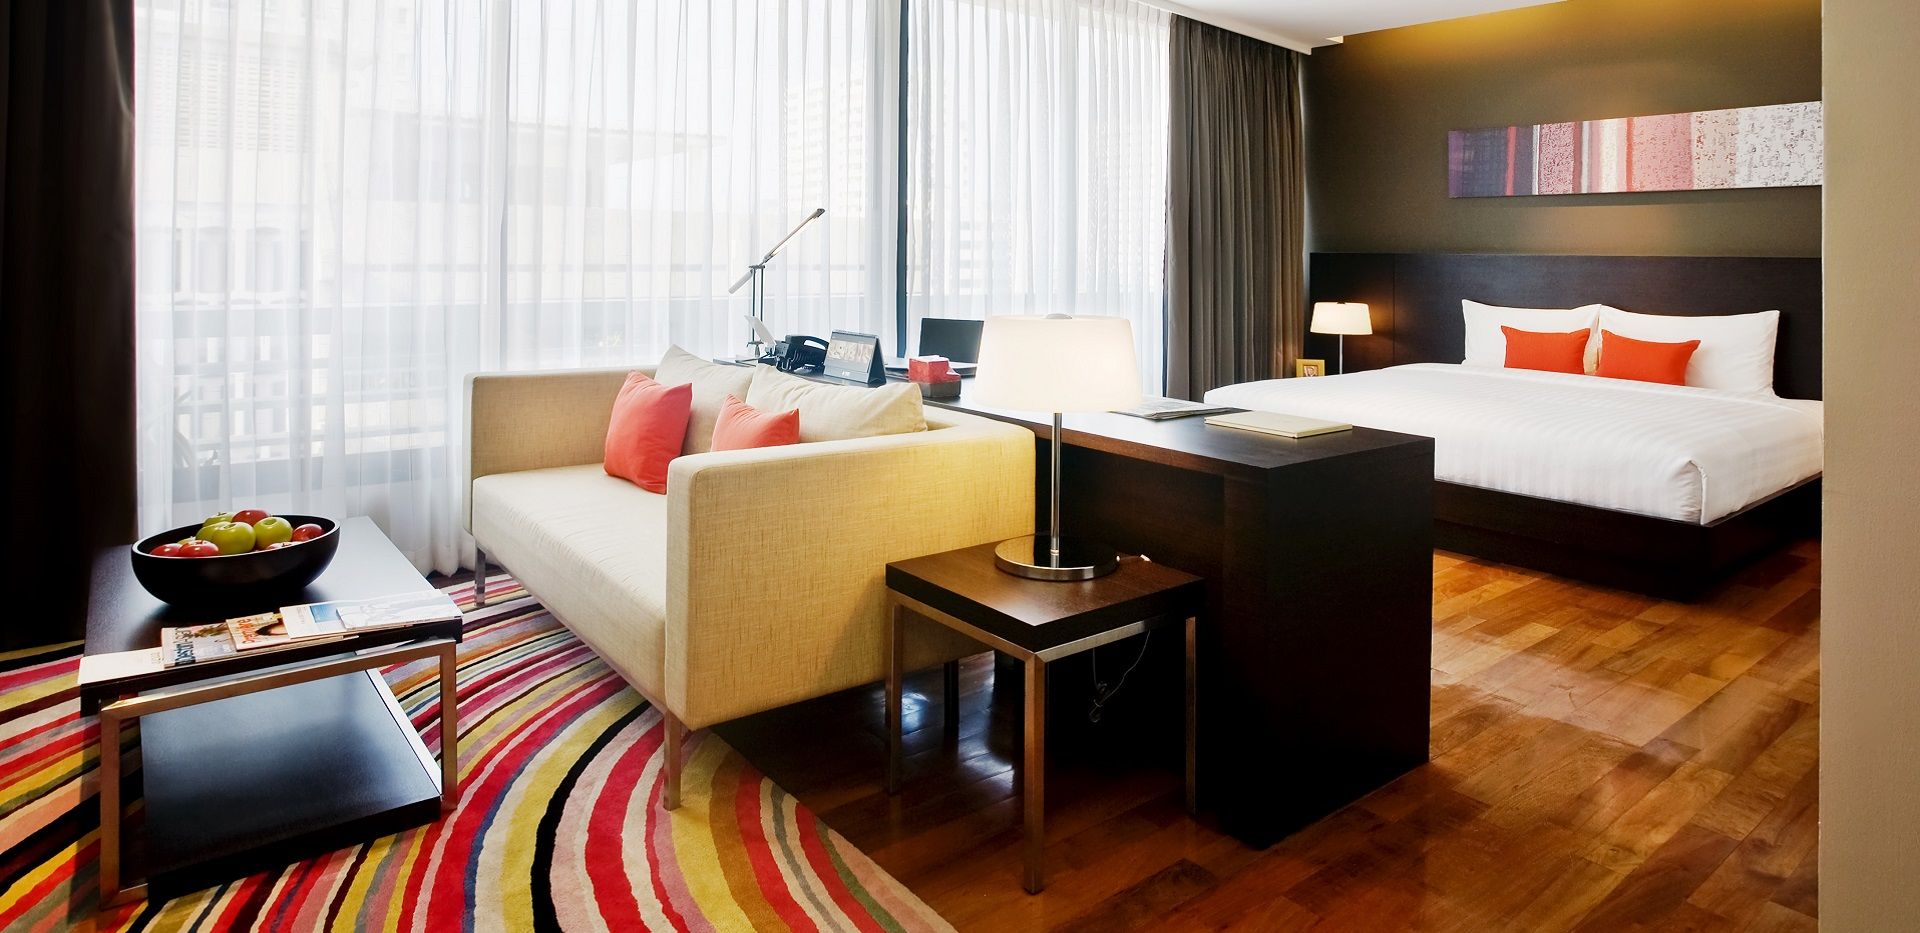 fraser-suites-sukhumvit-build-in-design-thailand-sohohospitality